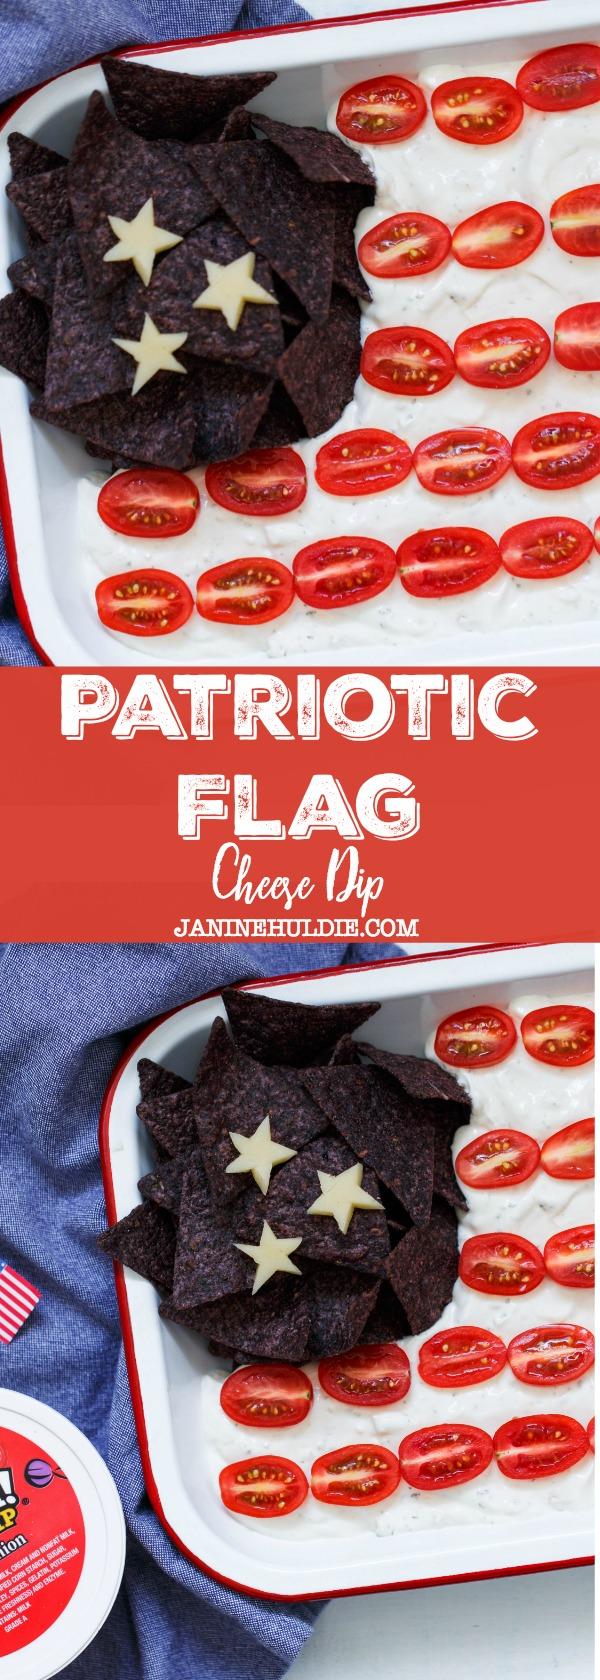 Patriotic Flag Cheese Dip